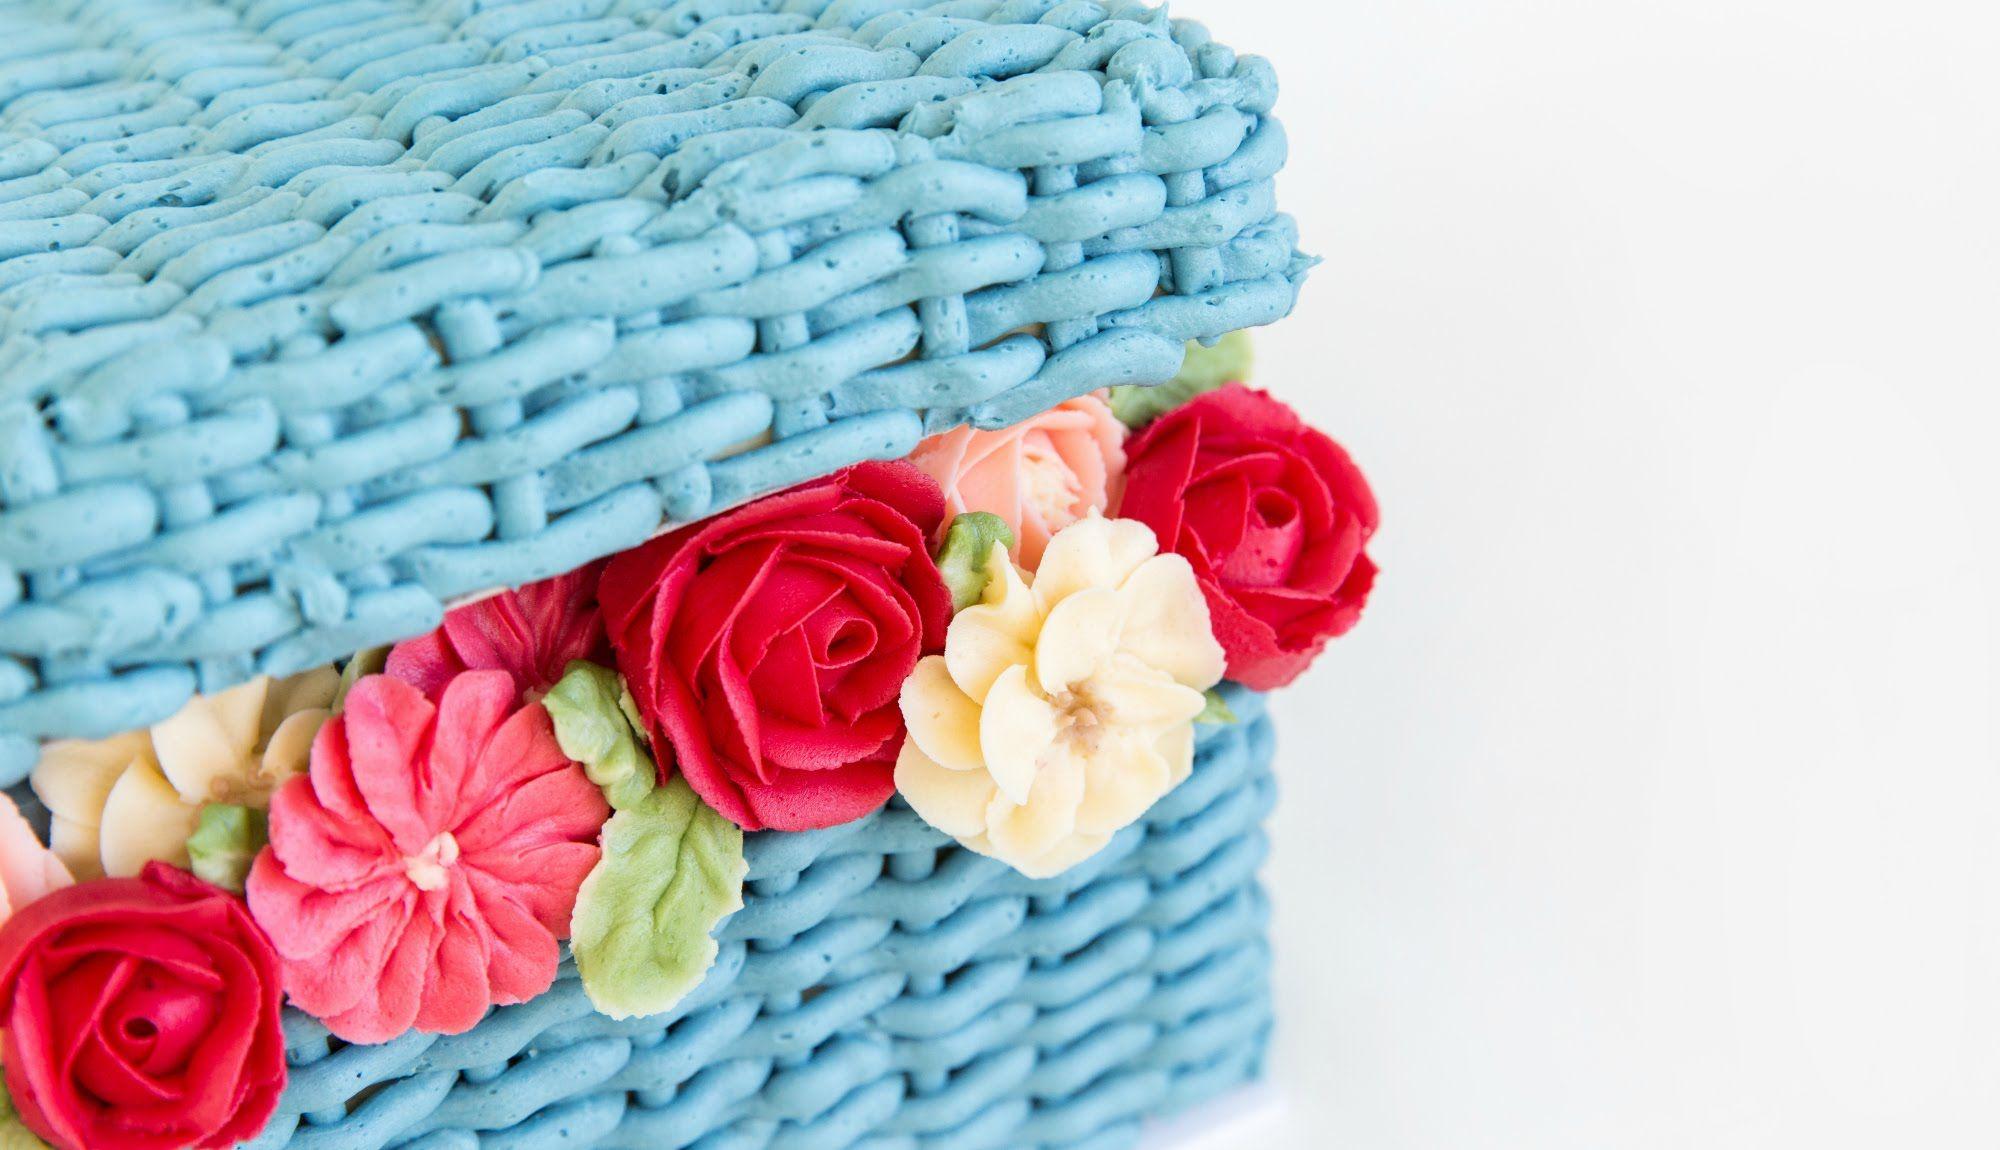 Beautiful flower basket cake decorating cake style youtube beautiful flower basket cake decorating cake style youtube izmirmasajfo